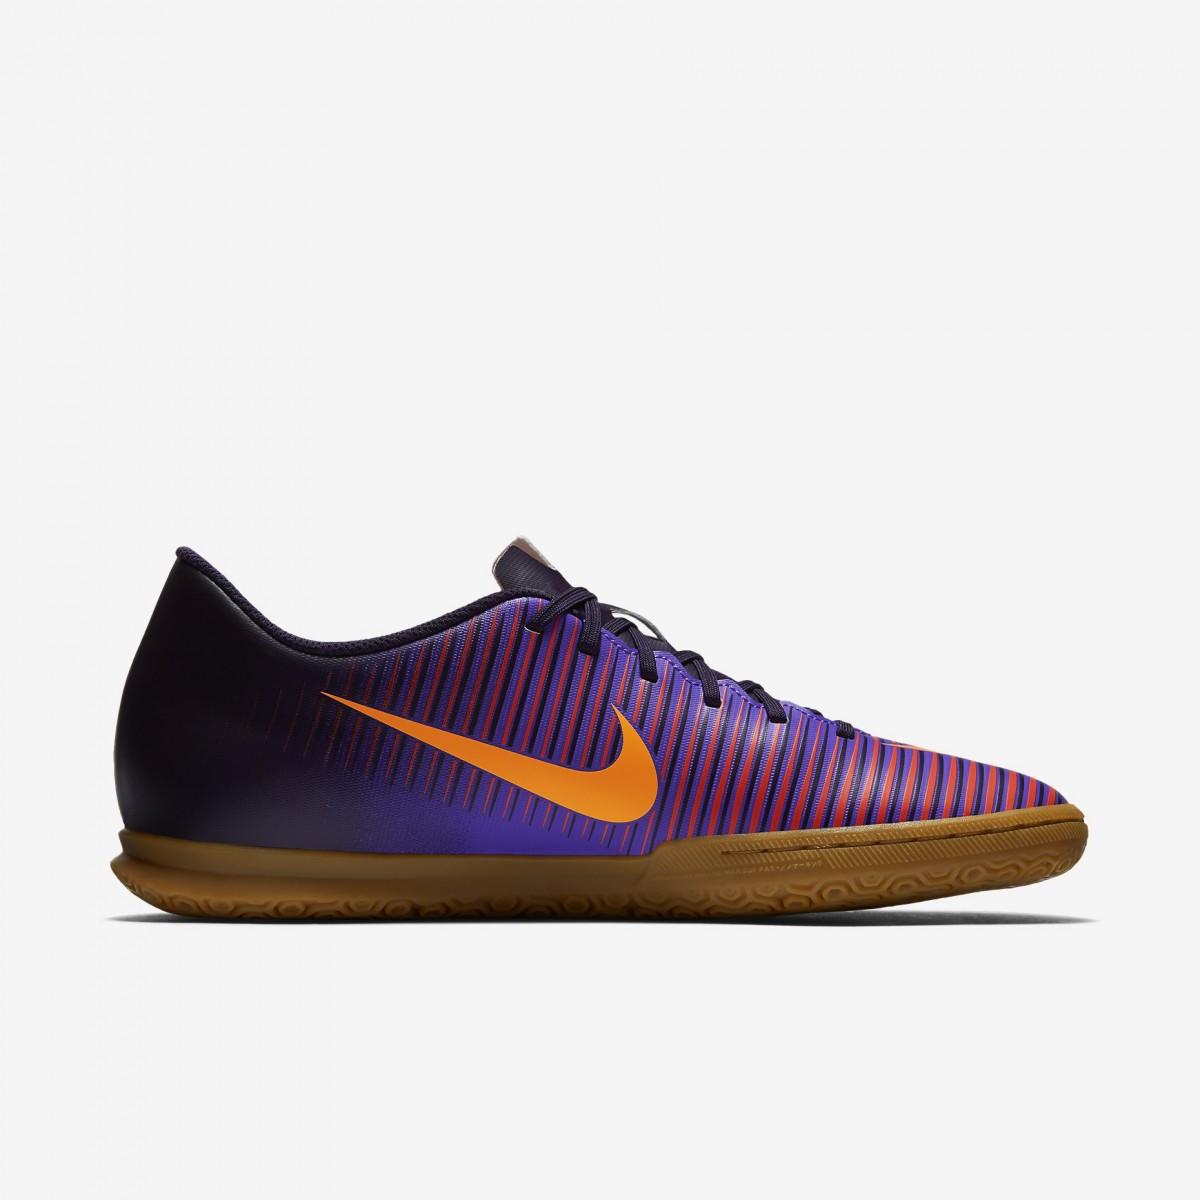 d758944b5c Bizz Store - Chuteira Futsal Nike Mercurial Vortex III Masculina